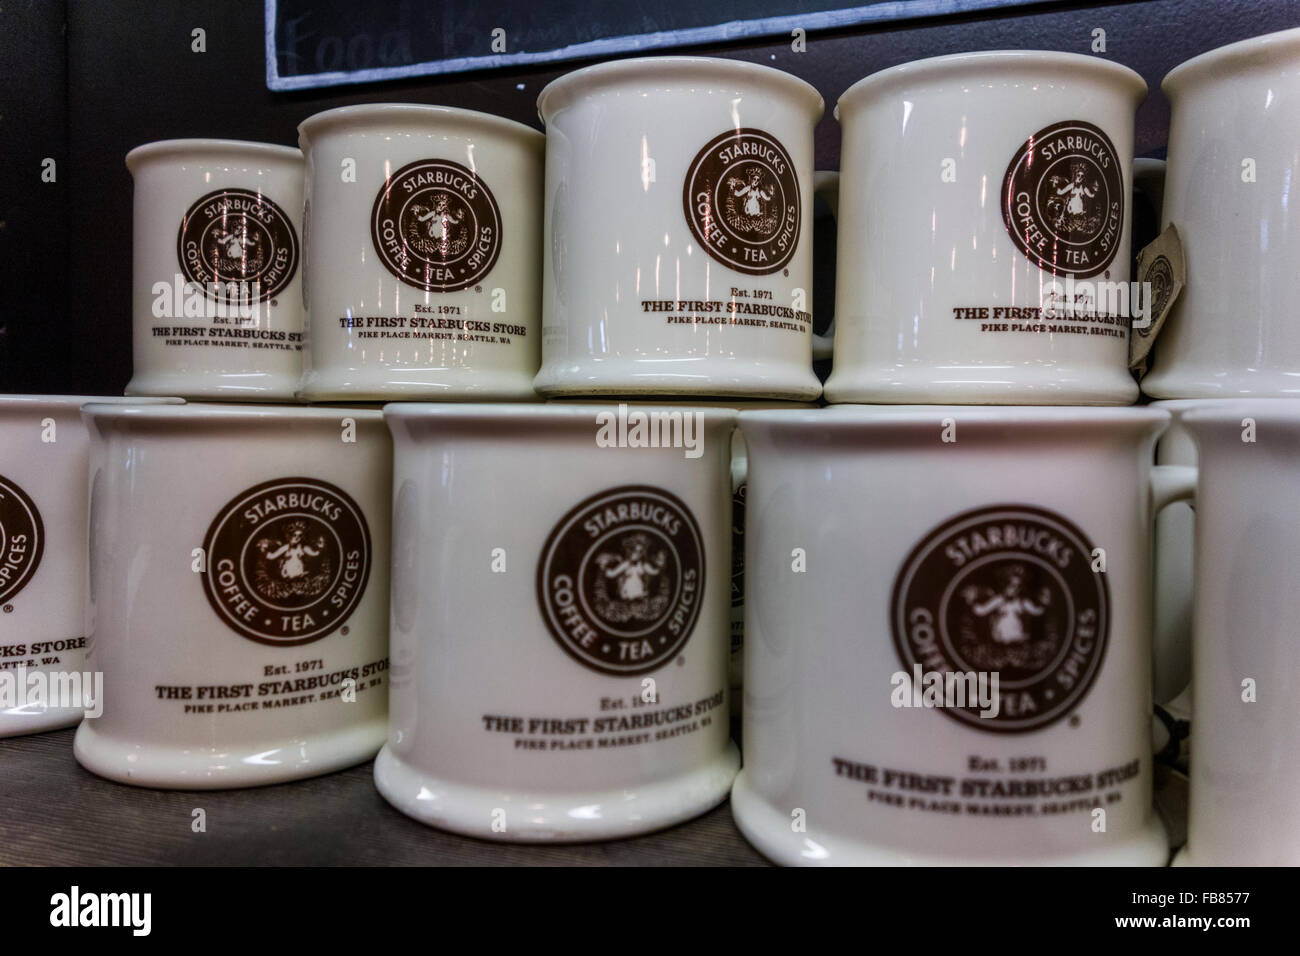 row of coffee mugs in original Starbucks store, Pike Place Market, Seattle, Washington State, USA - Stock Image